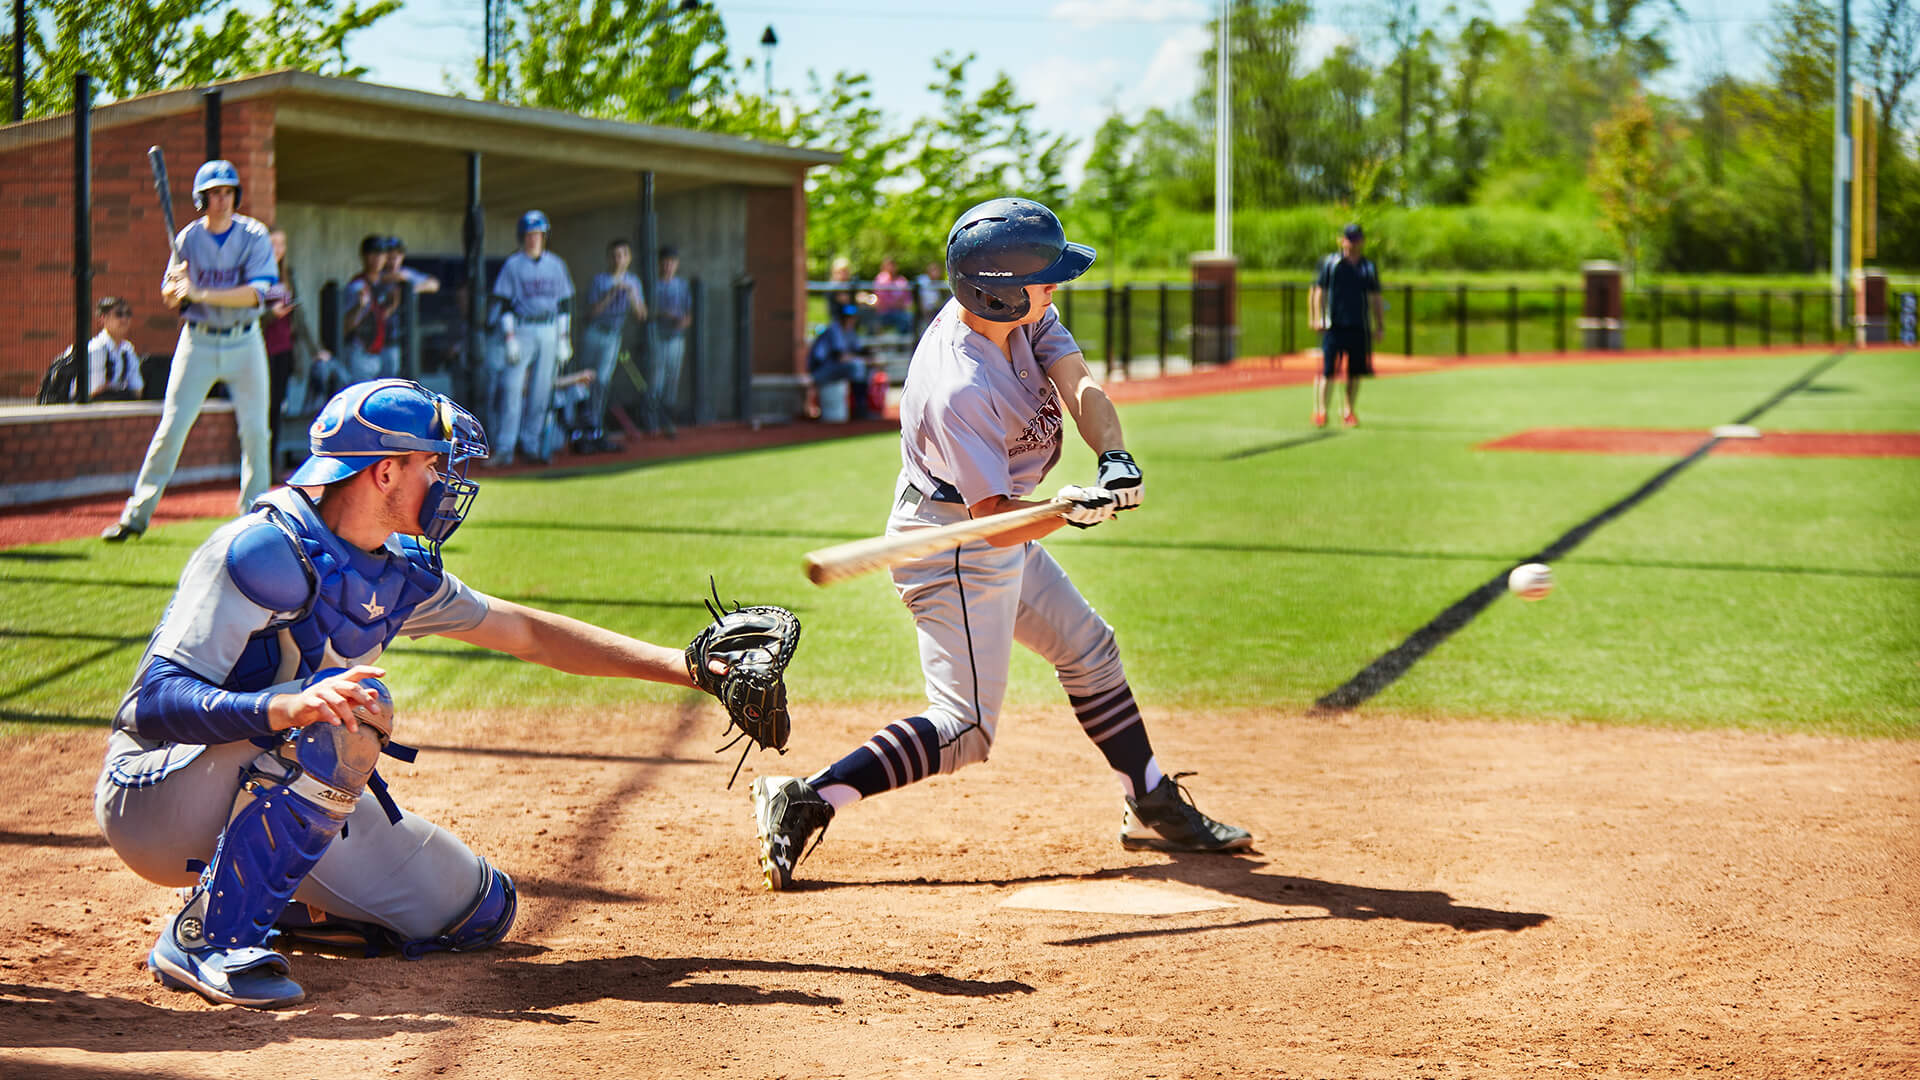 students playing baseball